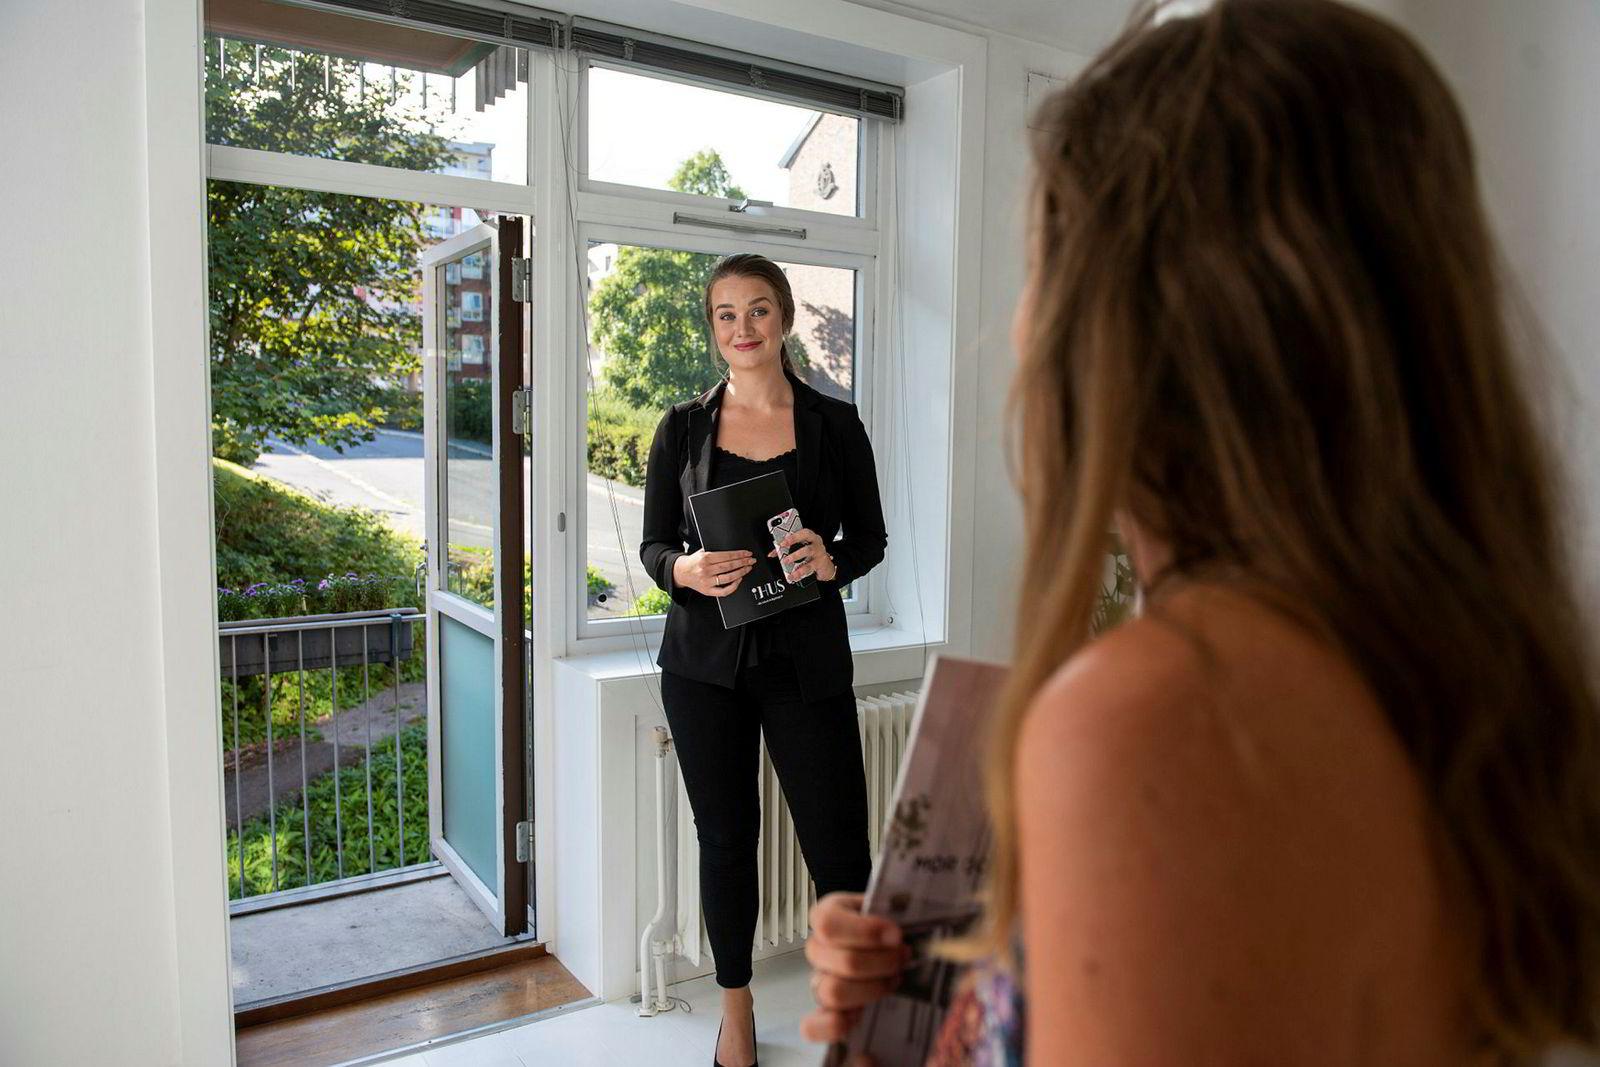 Ihus Megler Eline Tilley viser frem en leilighet på Bjølsen.